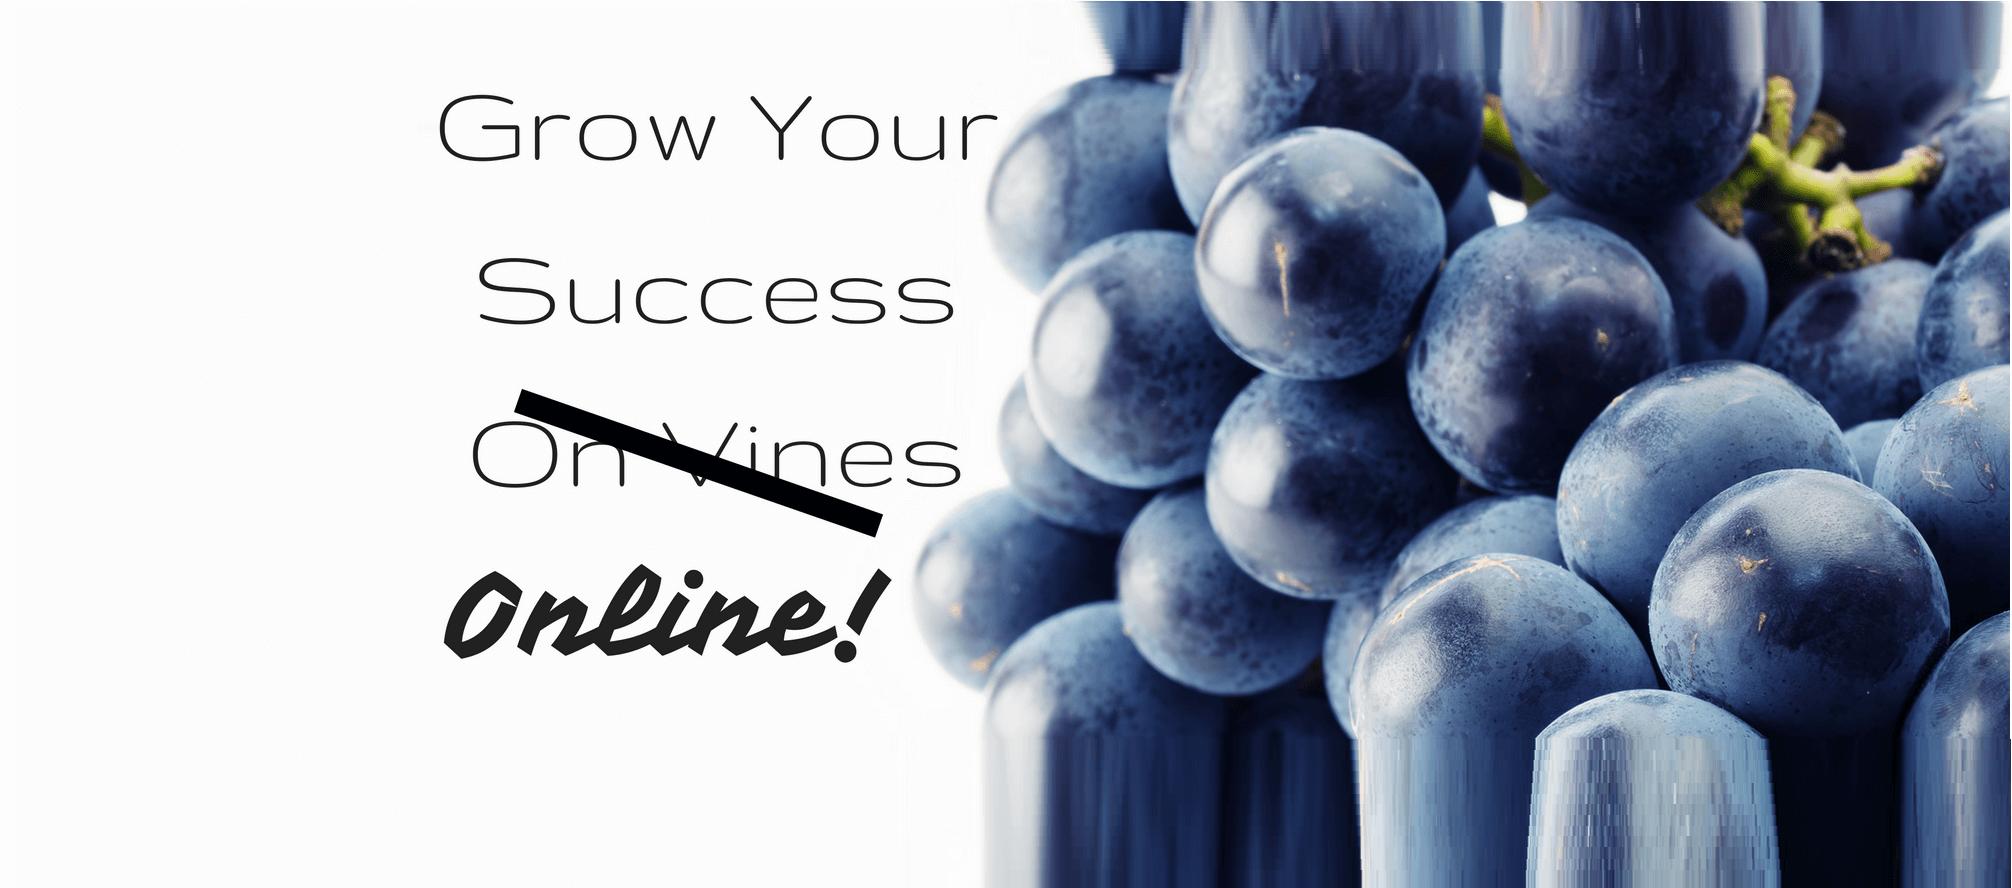 Grow Traffic Online - Not On Vines